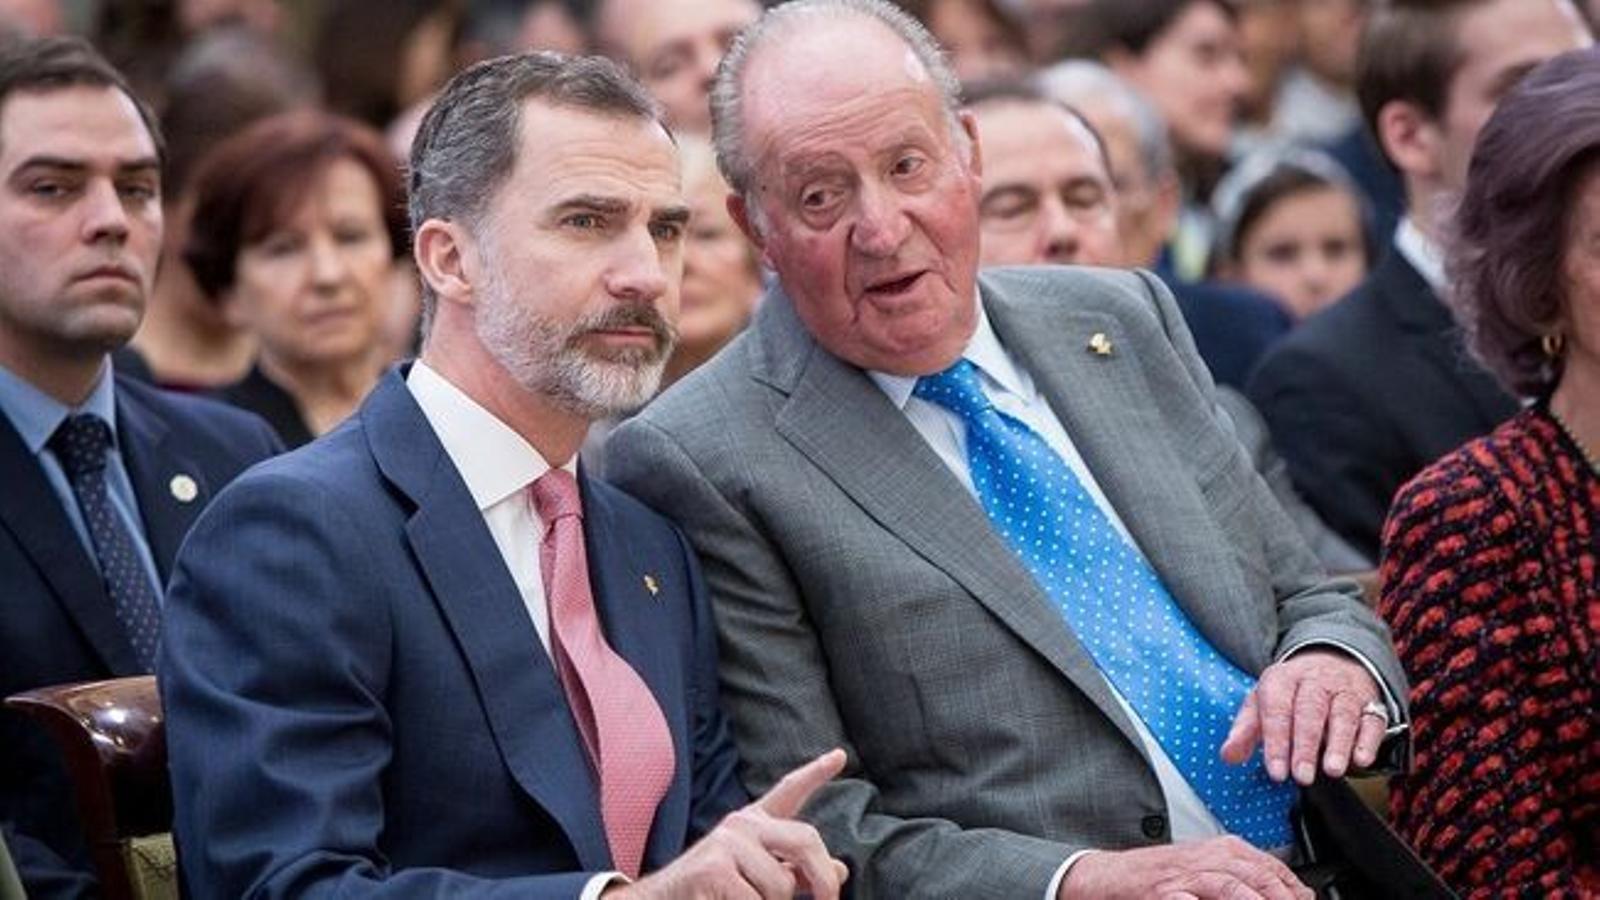 Felip VI i el rei emèrit, Joan Carles I. / PABLO CUADRA/ GETTY